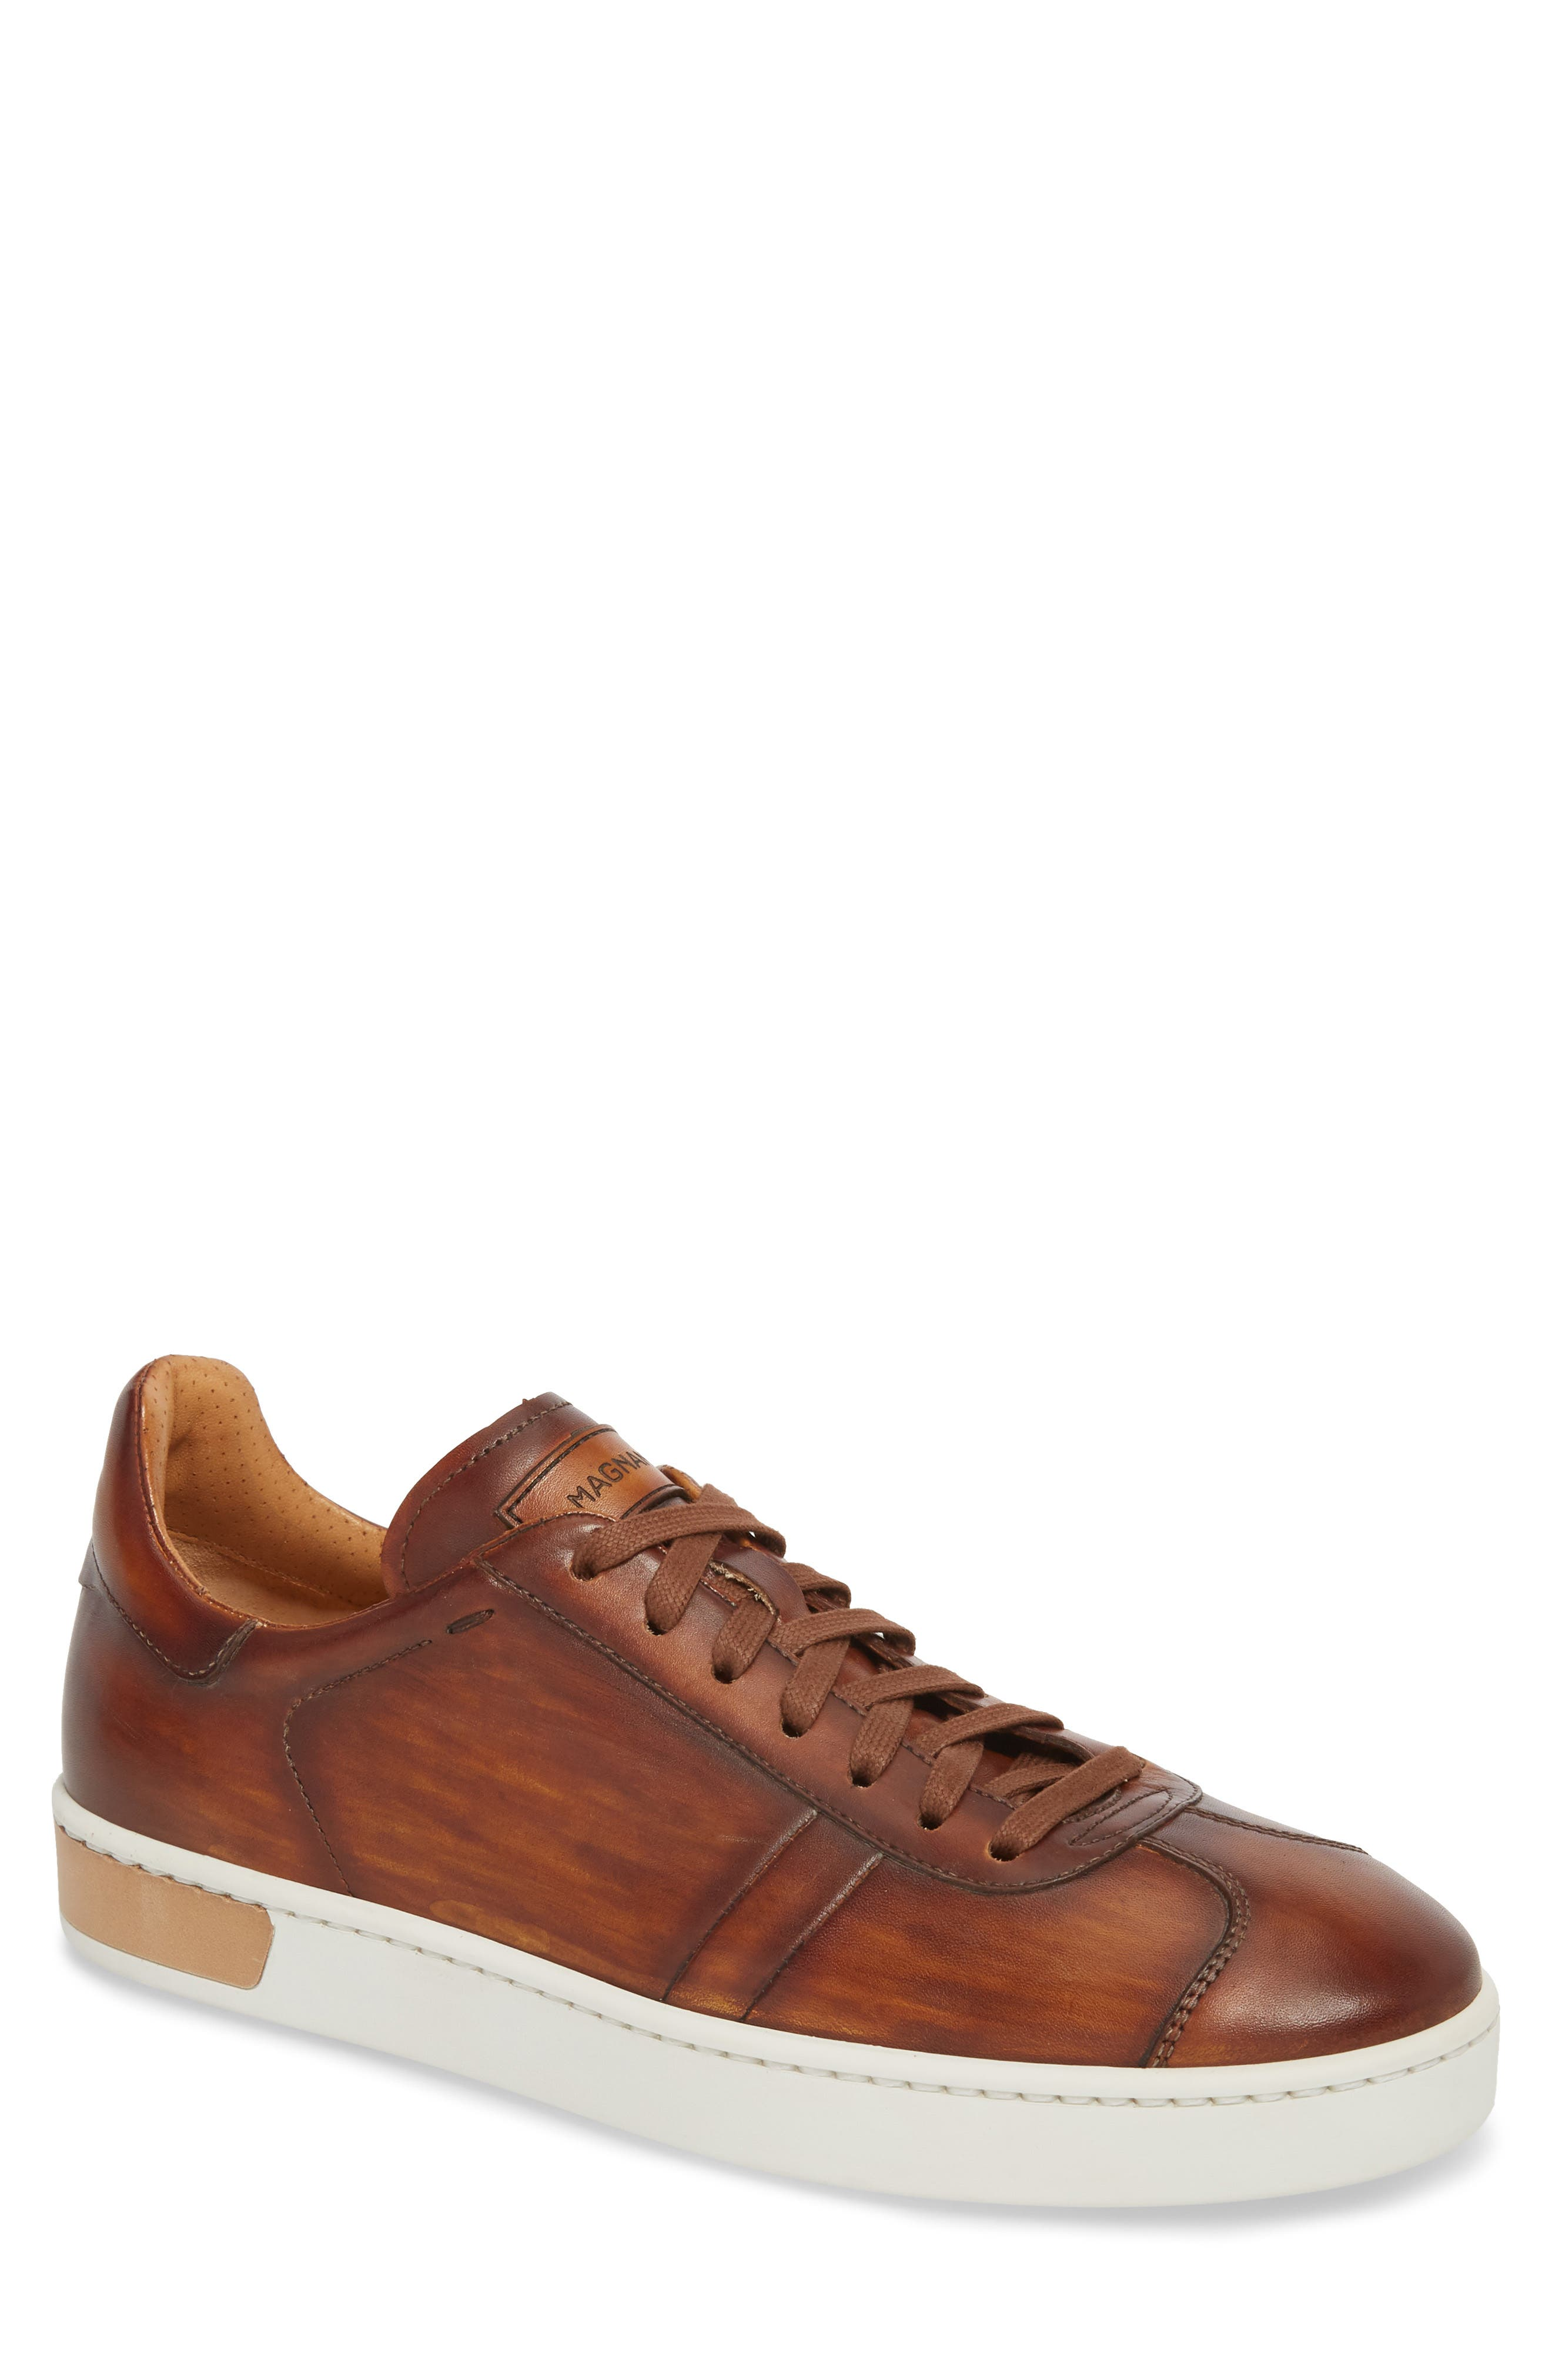 Gunner Low Top Sneaker,                             Main thumbnail 1, color,                             Cuero Leather